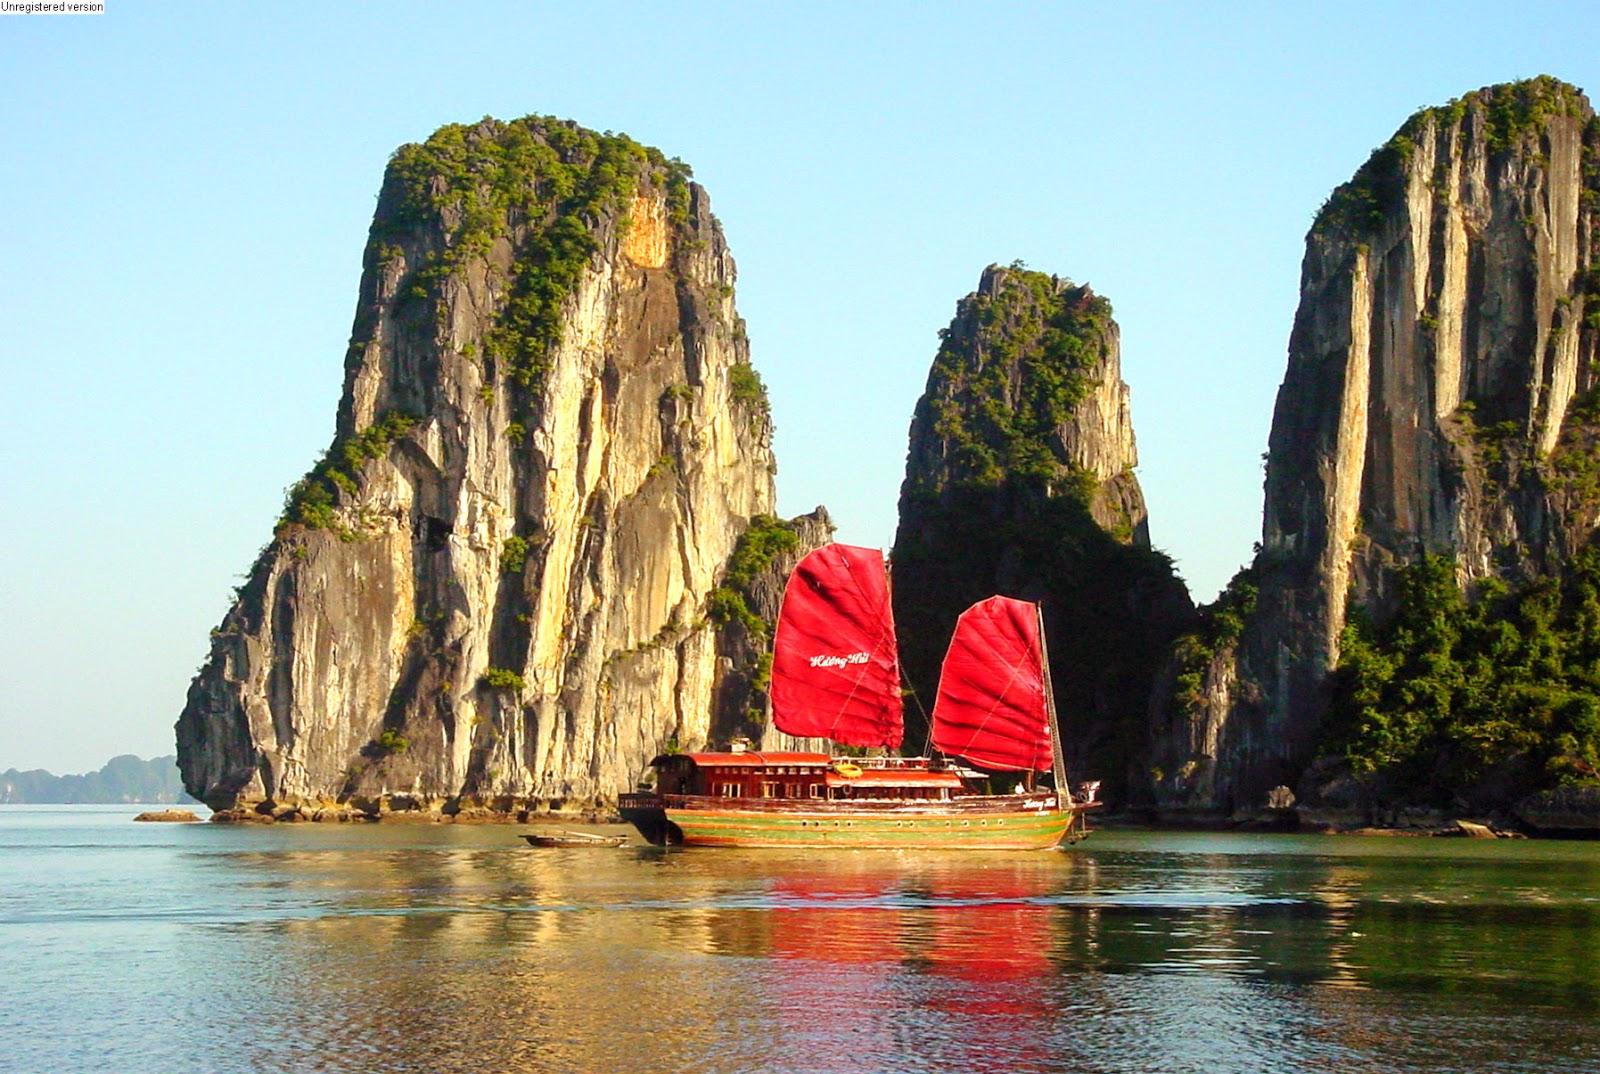 Куриз по Бухте Халонг во Вьетнаме